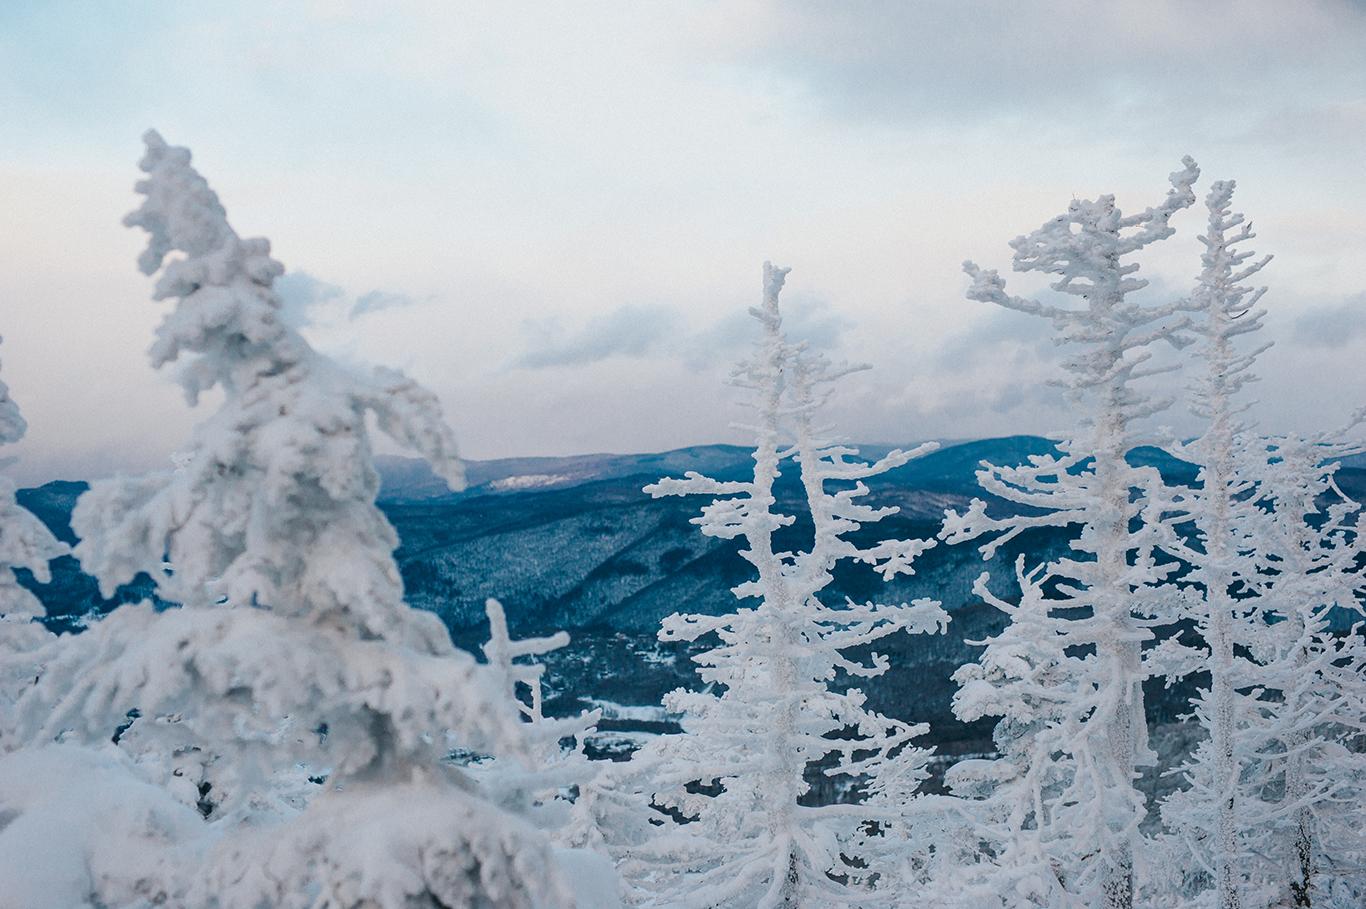 snow-covered-trees-engagement-idena-photographer-killington-vermont.jpg